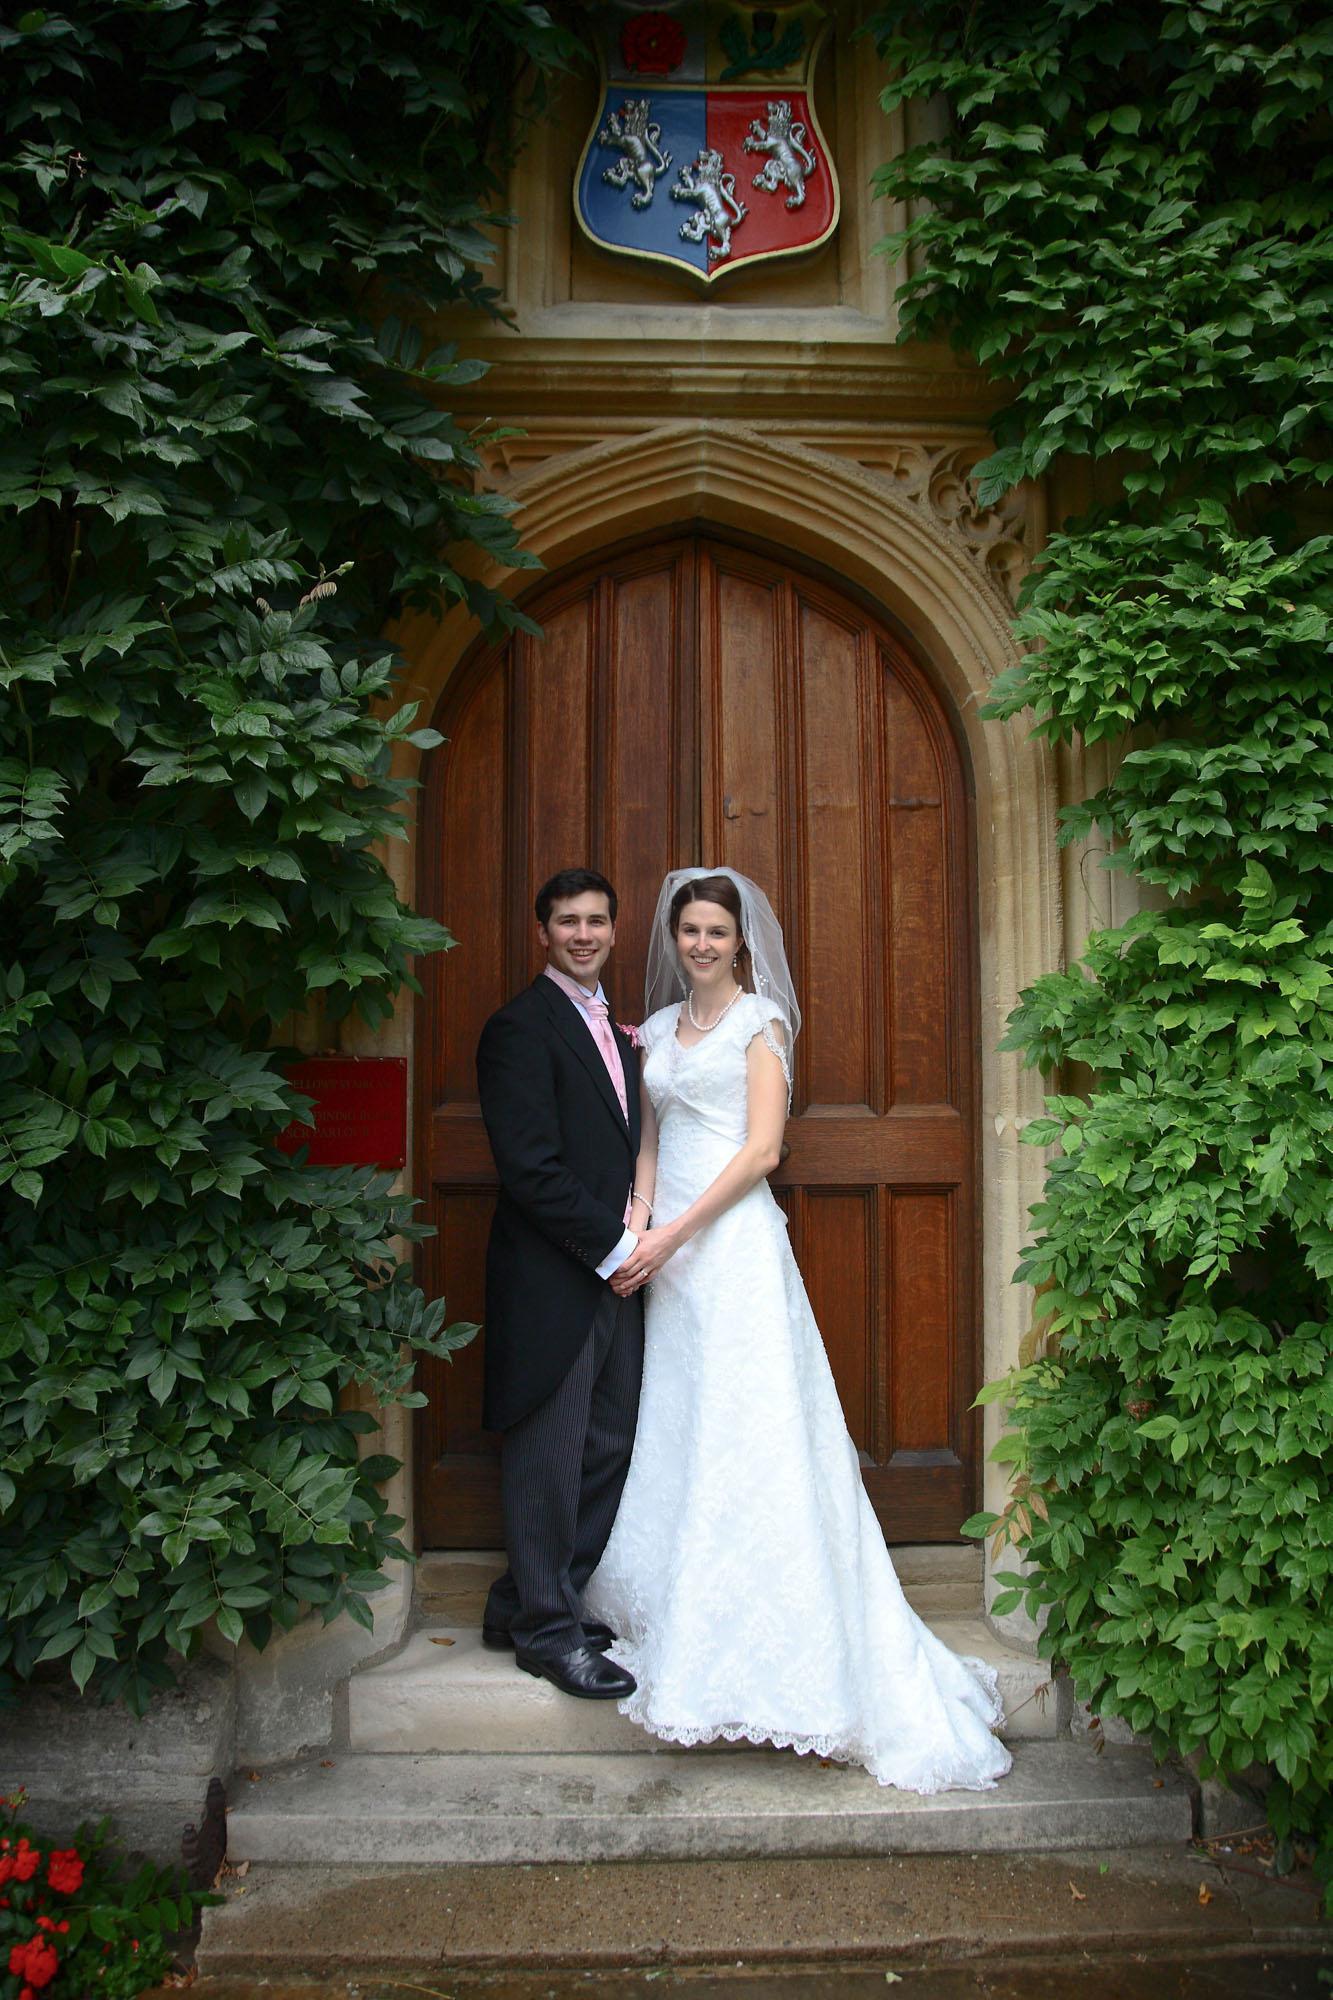 weddings-couples-love-photographer-oxford-london-jonathan-self-photography-85.jpg